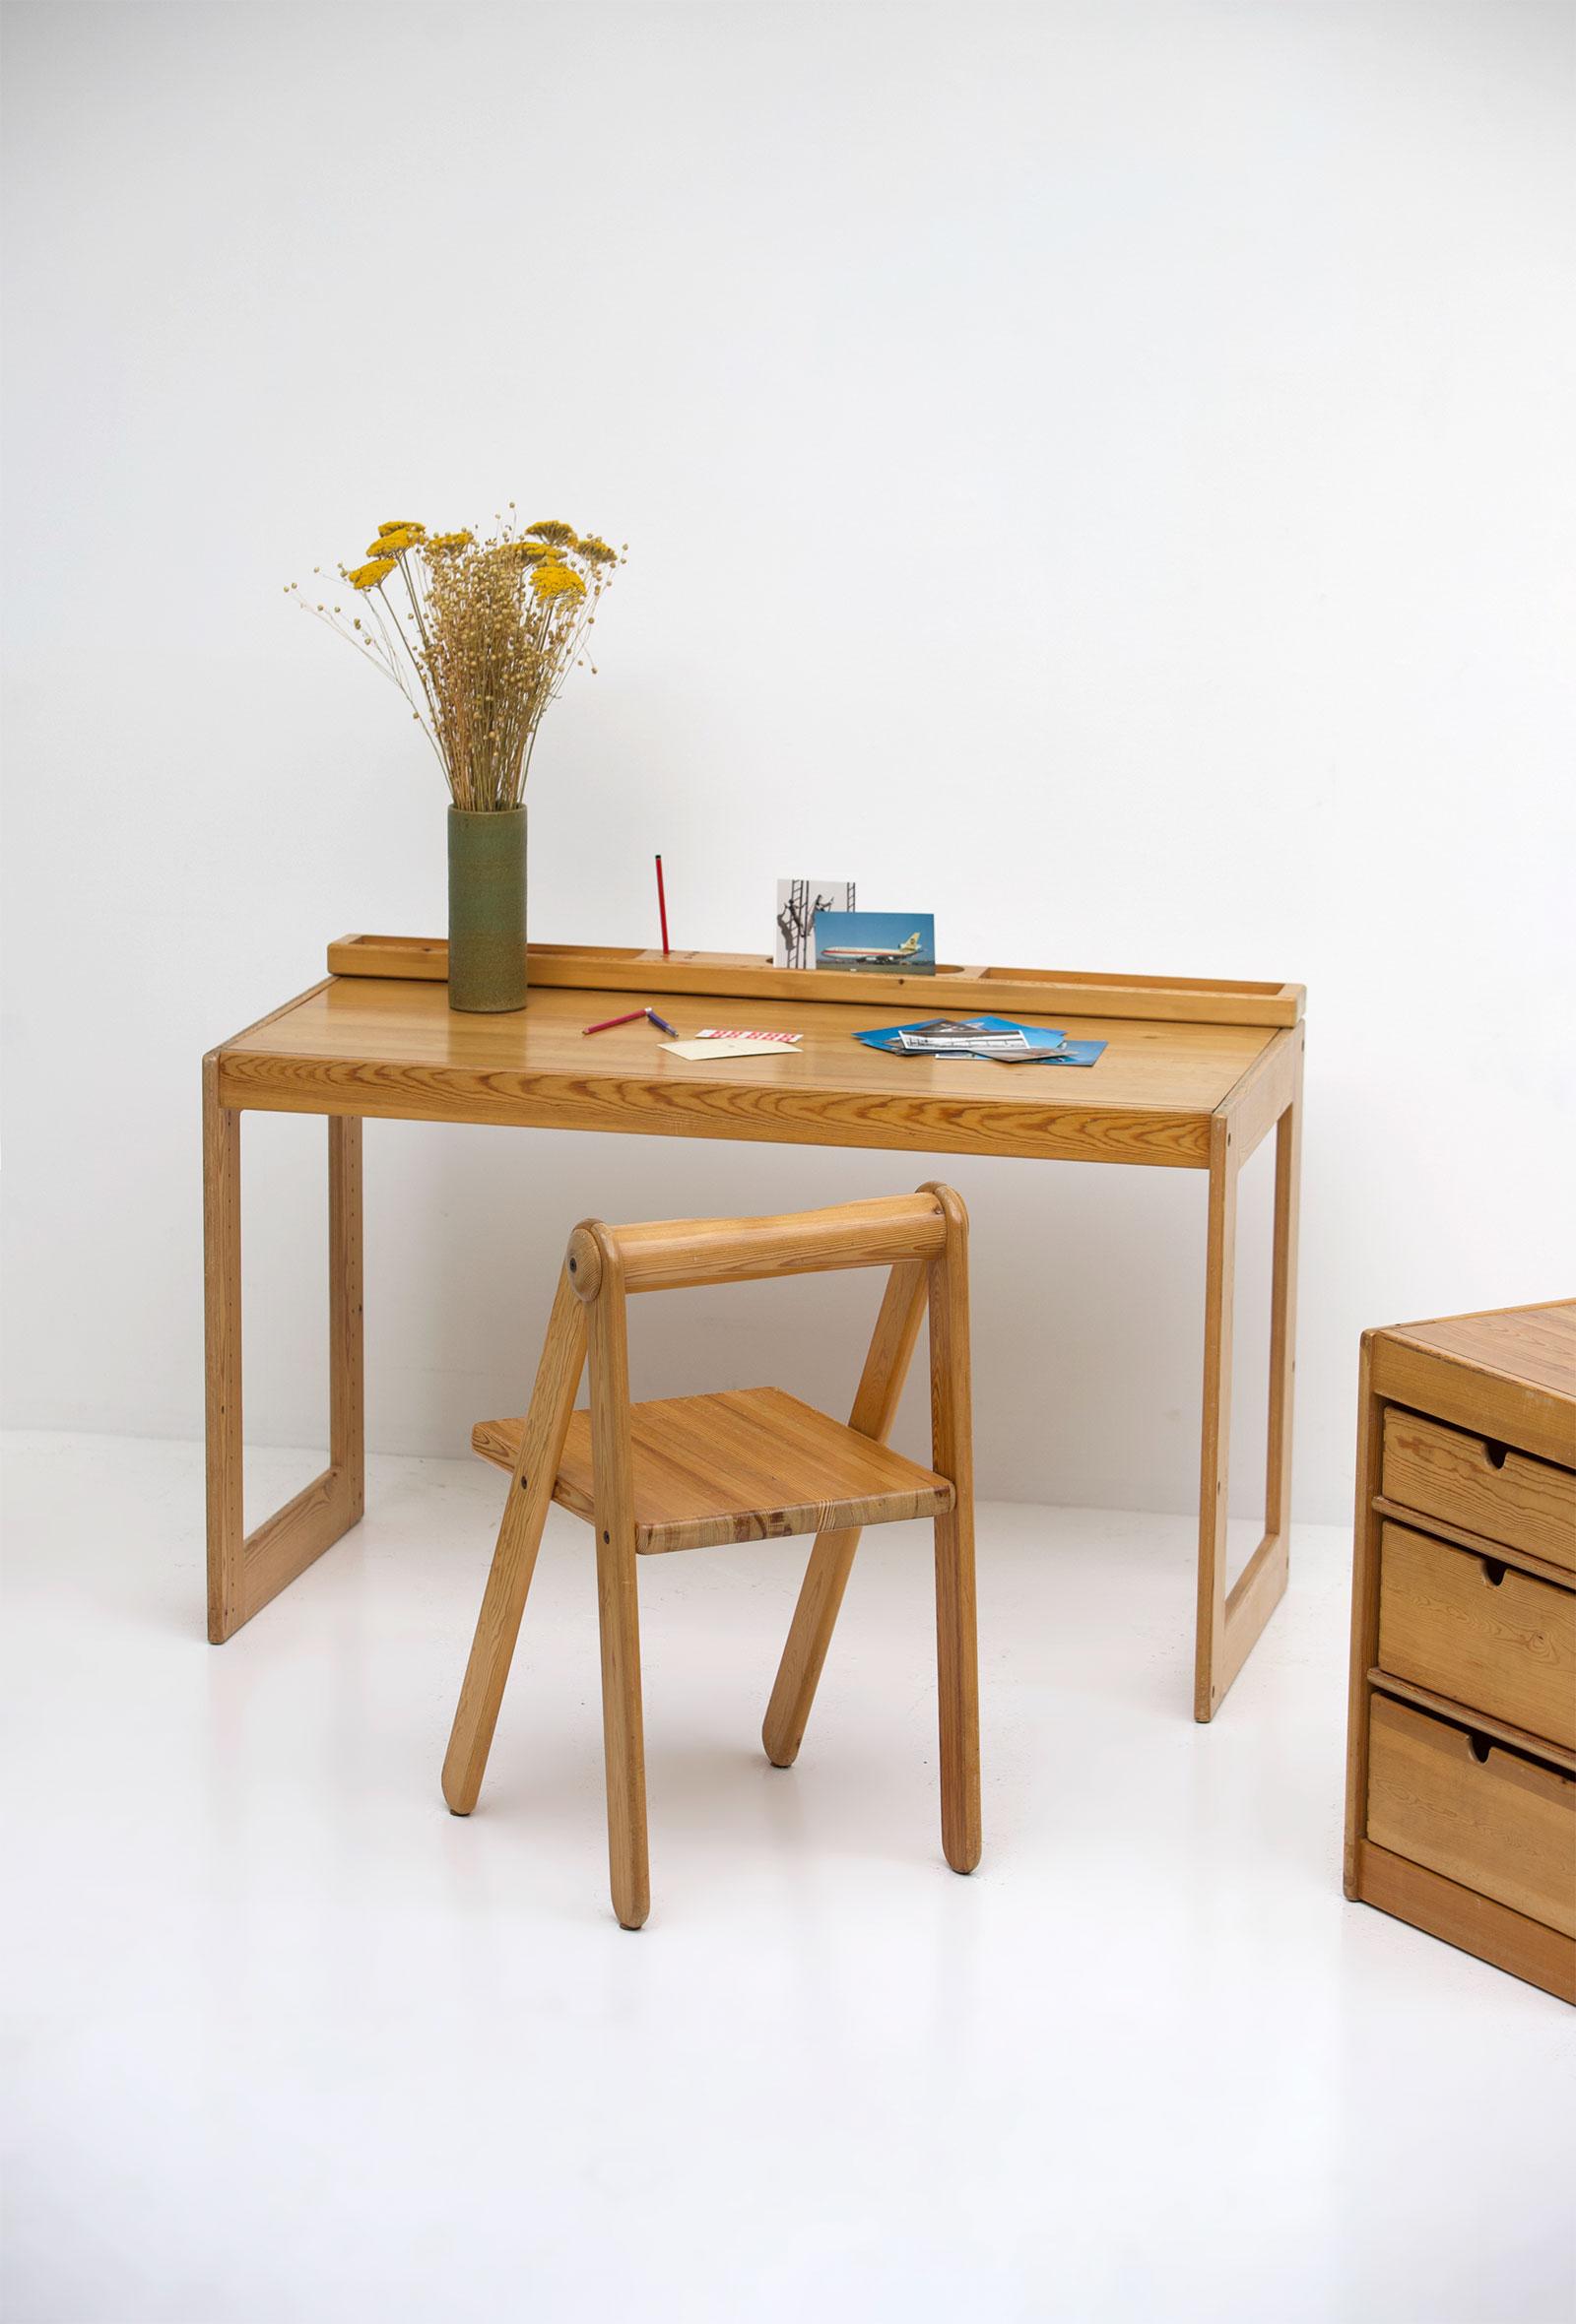 Childrens desk furniture by Pierre Grosjean for Junior Design